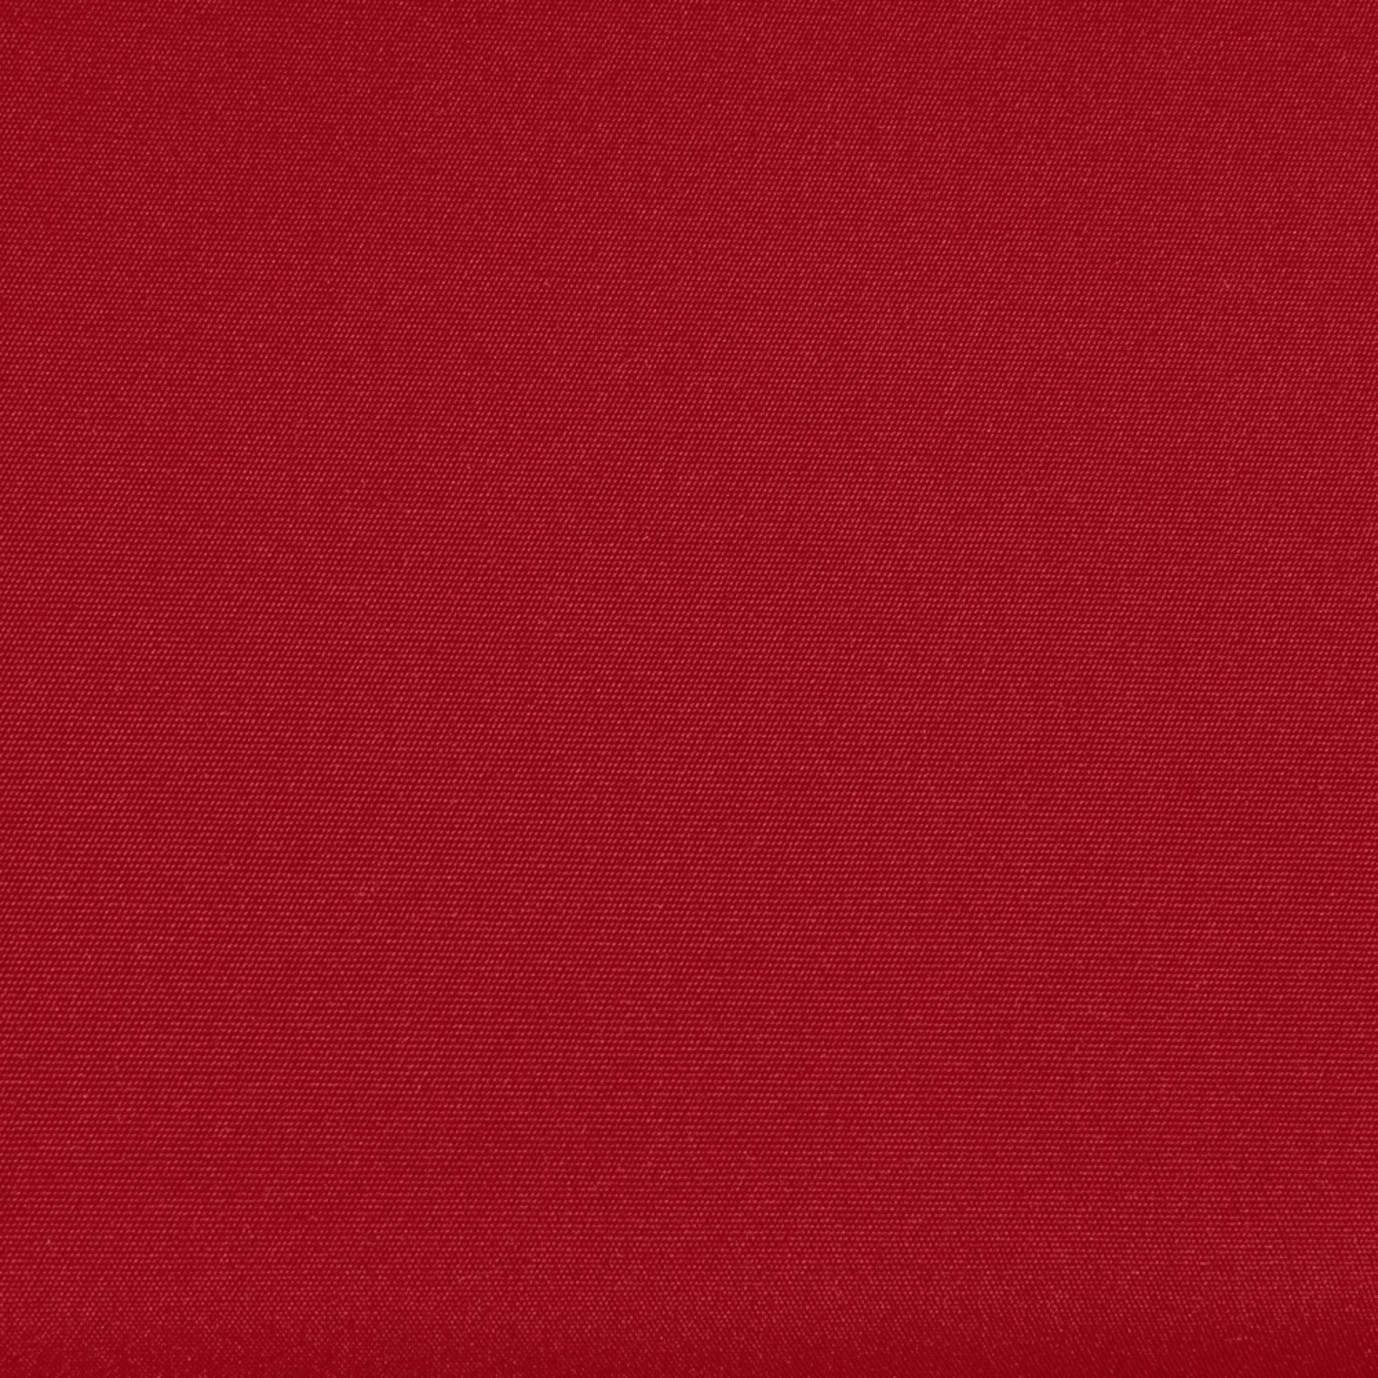 Milo™ Espresso 9 Piece Dining Set - Sunset Red